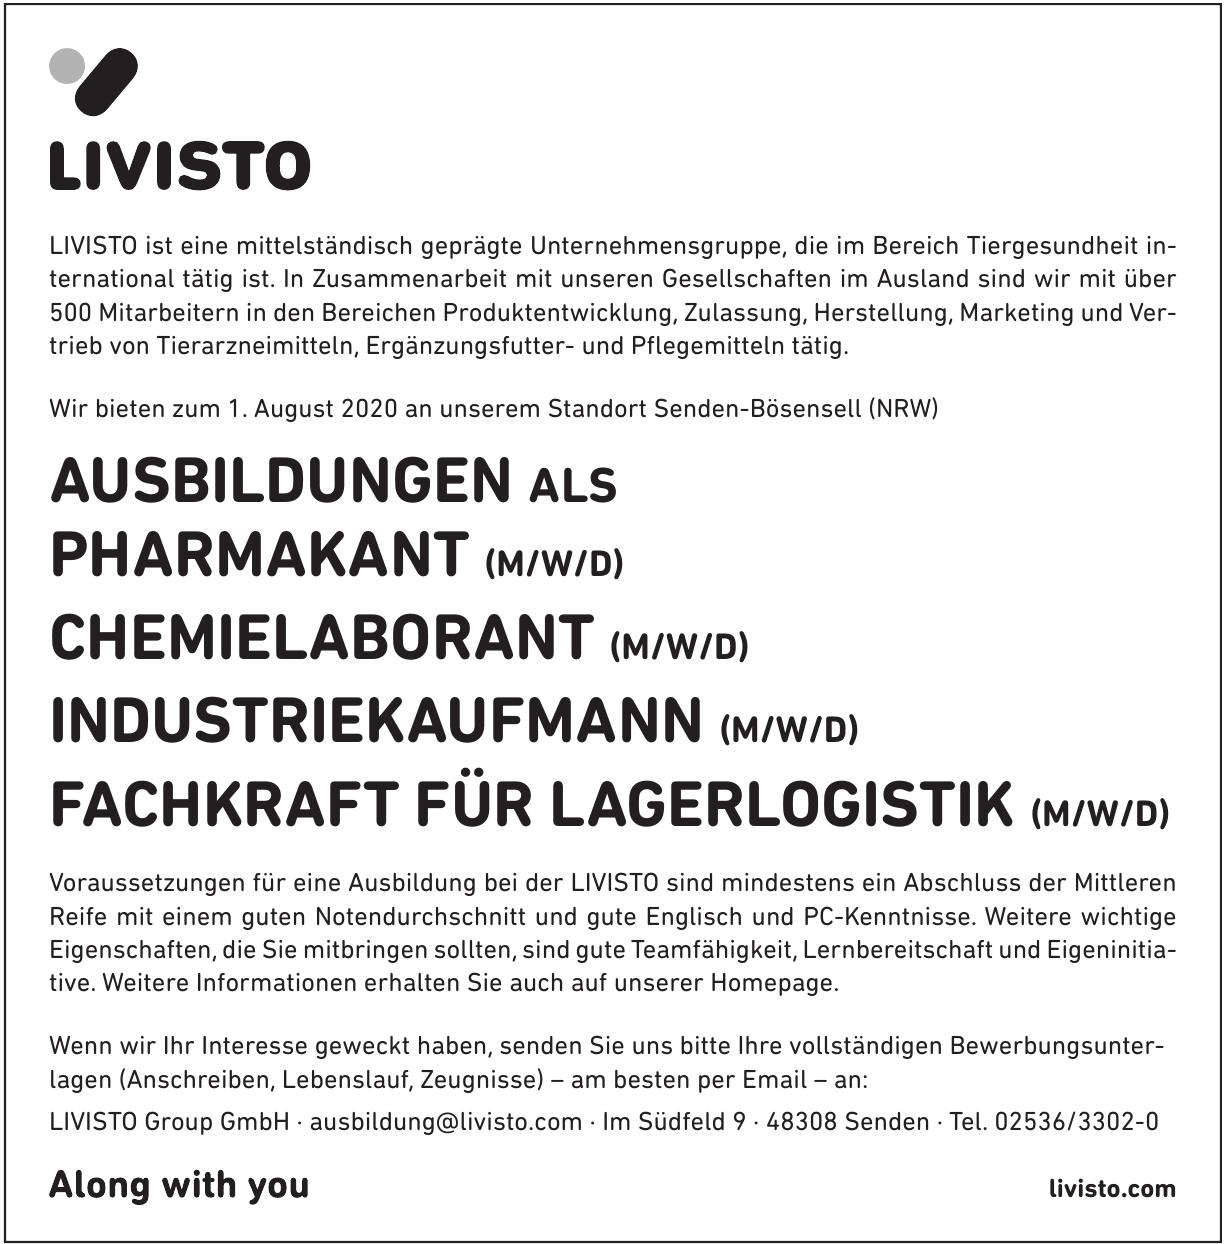 LIVISTO Group GmbH